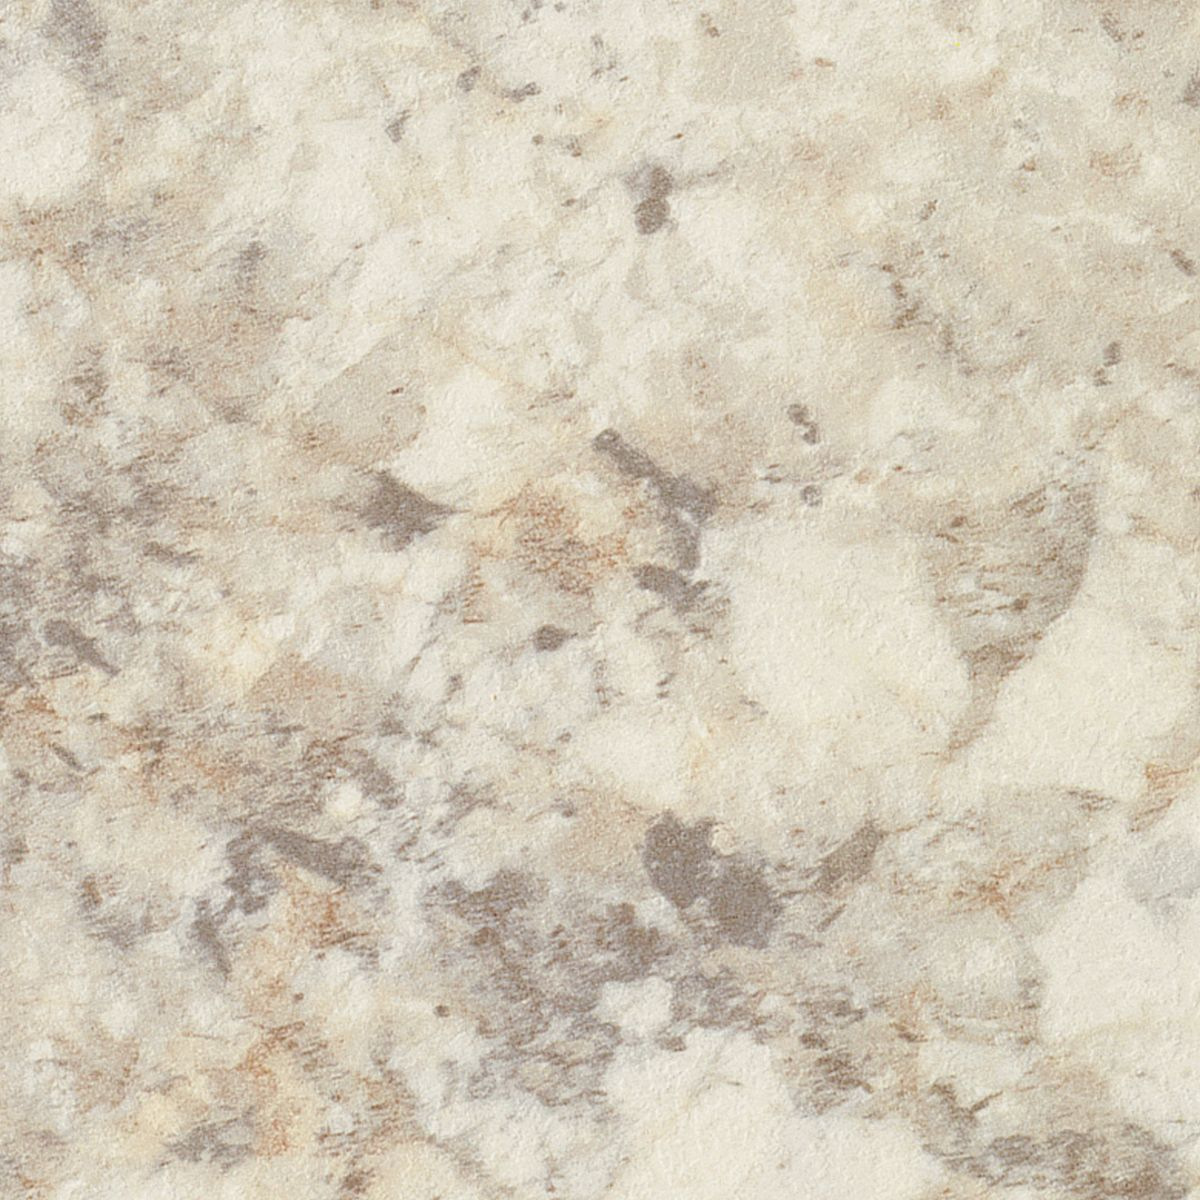 Crema Mascarello Formica Brand Radiance Finish Rd Code 3422 Laminate